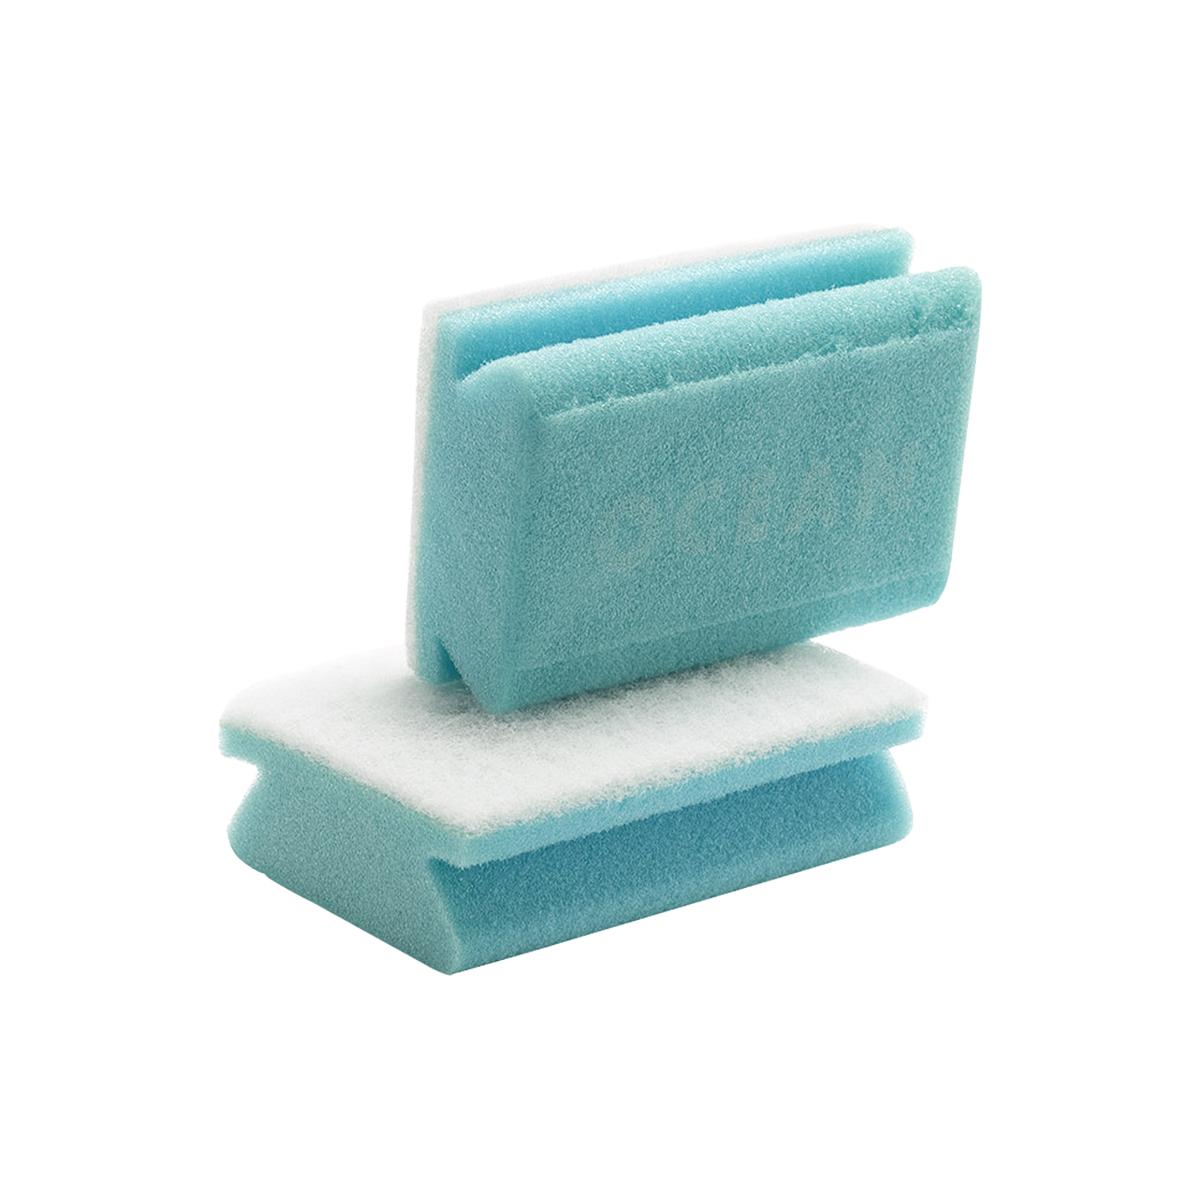 Handschrubber Ocean blau, im Doppelpack, lose verpackt Handschrubber Ocean blau, im Doppelpack, lose verpackt